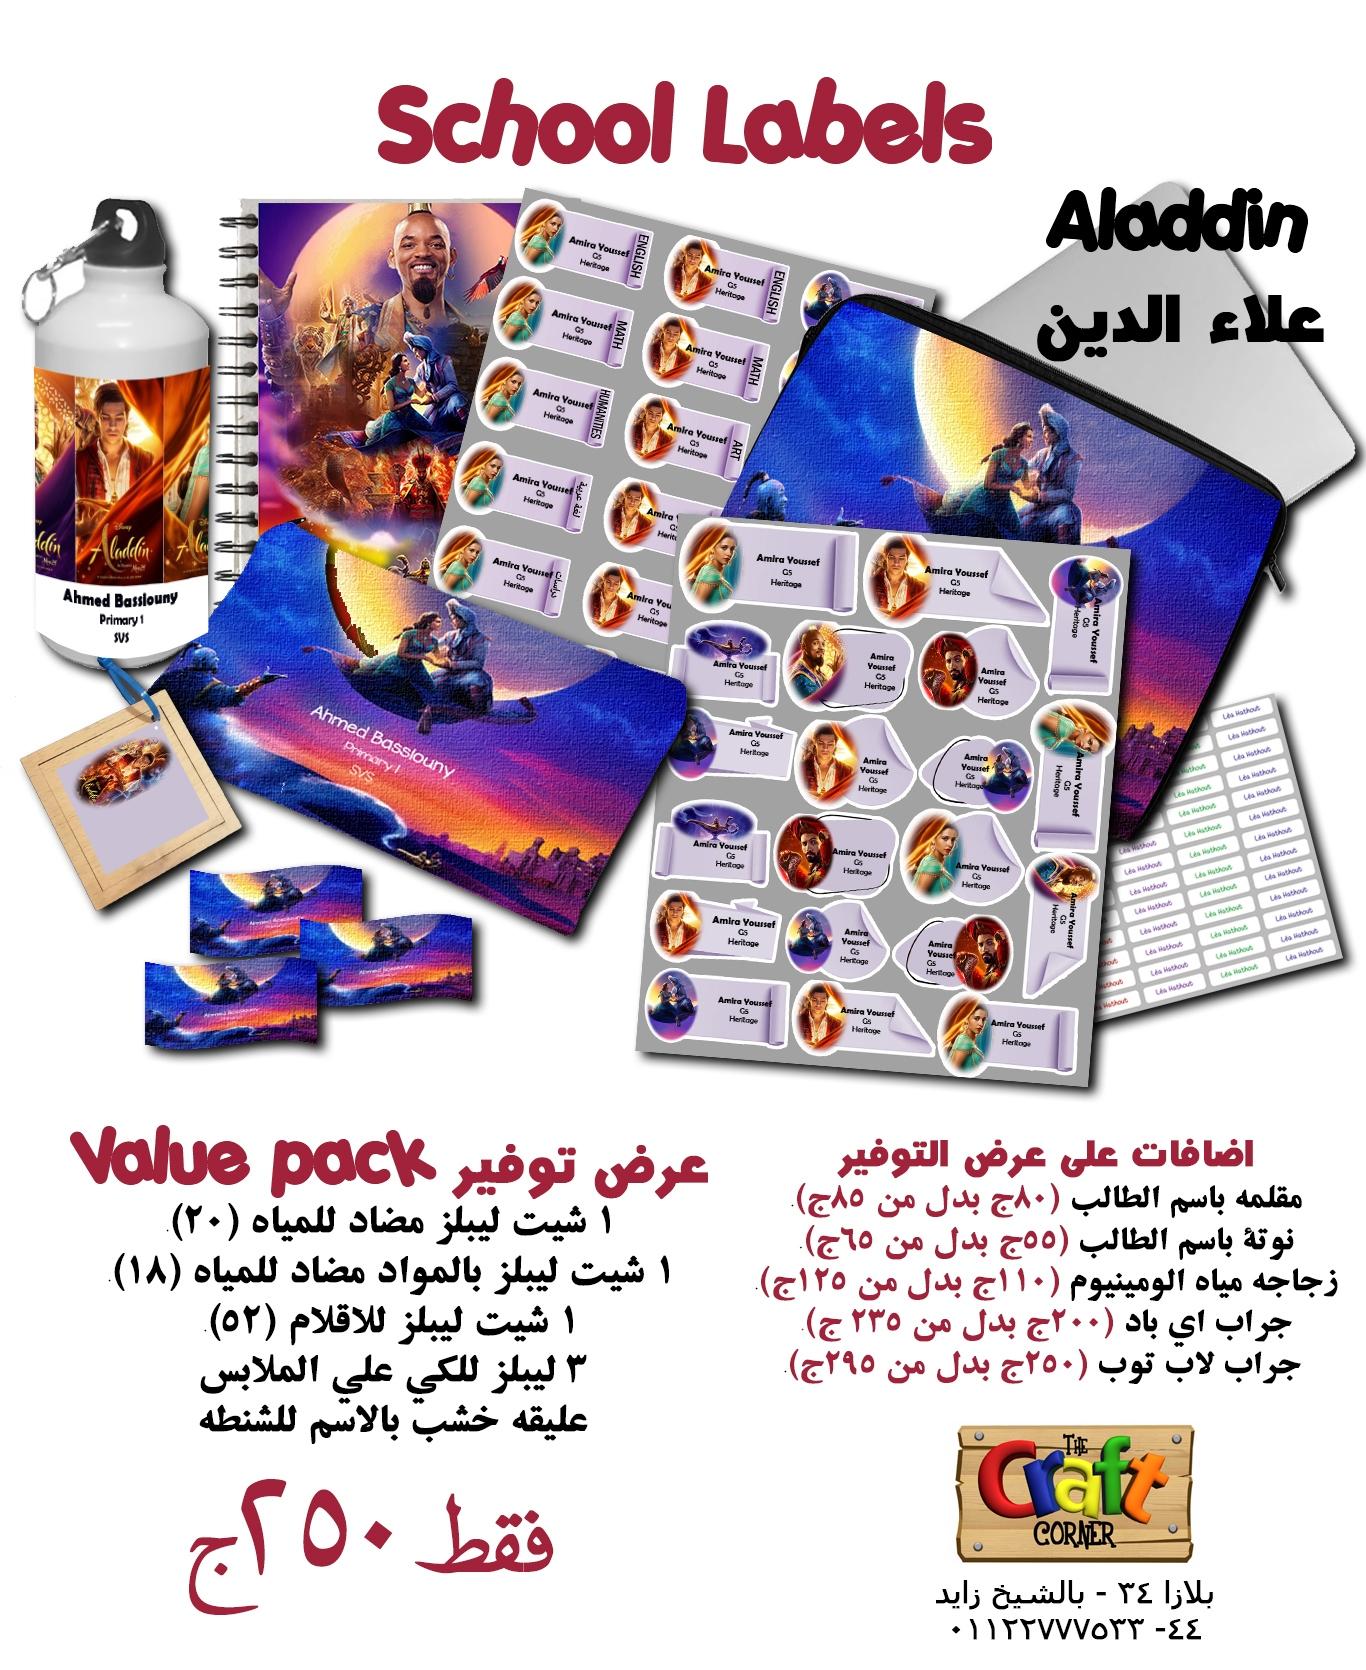 aladin ad arabic